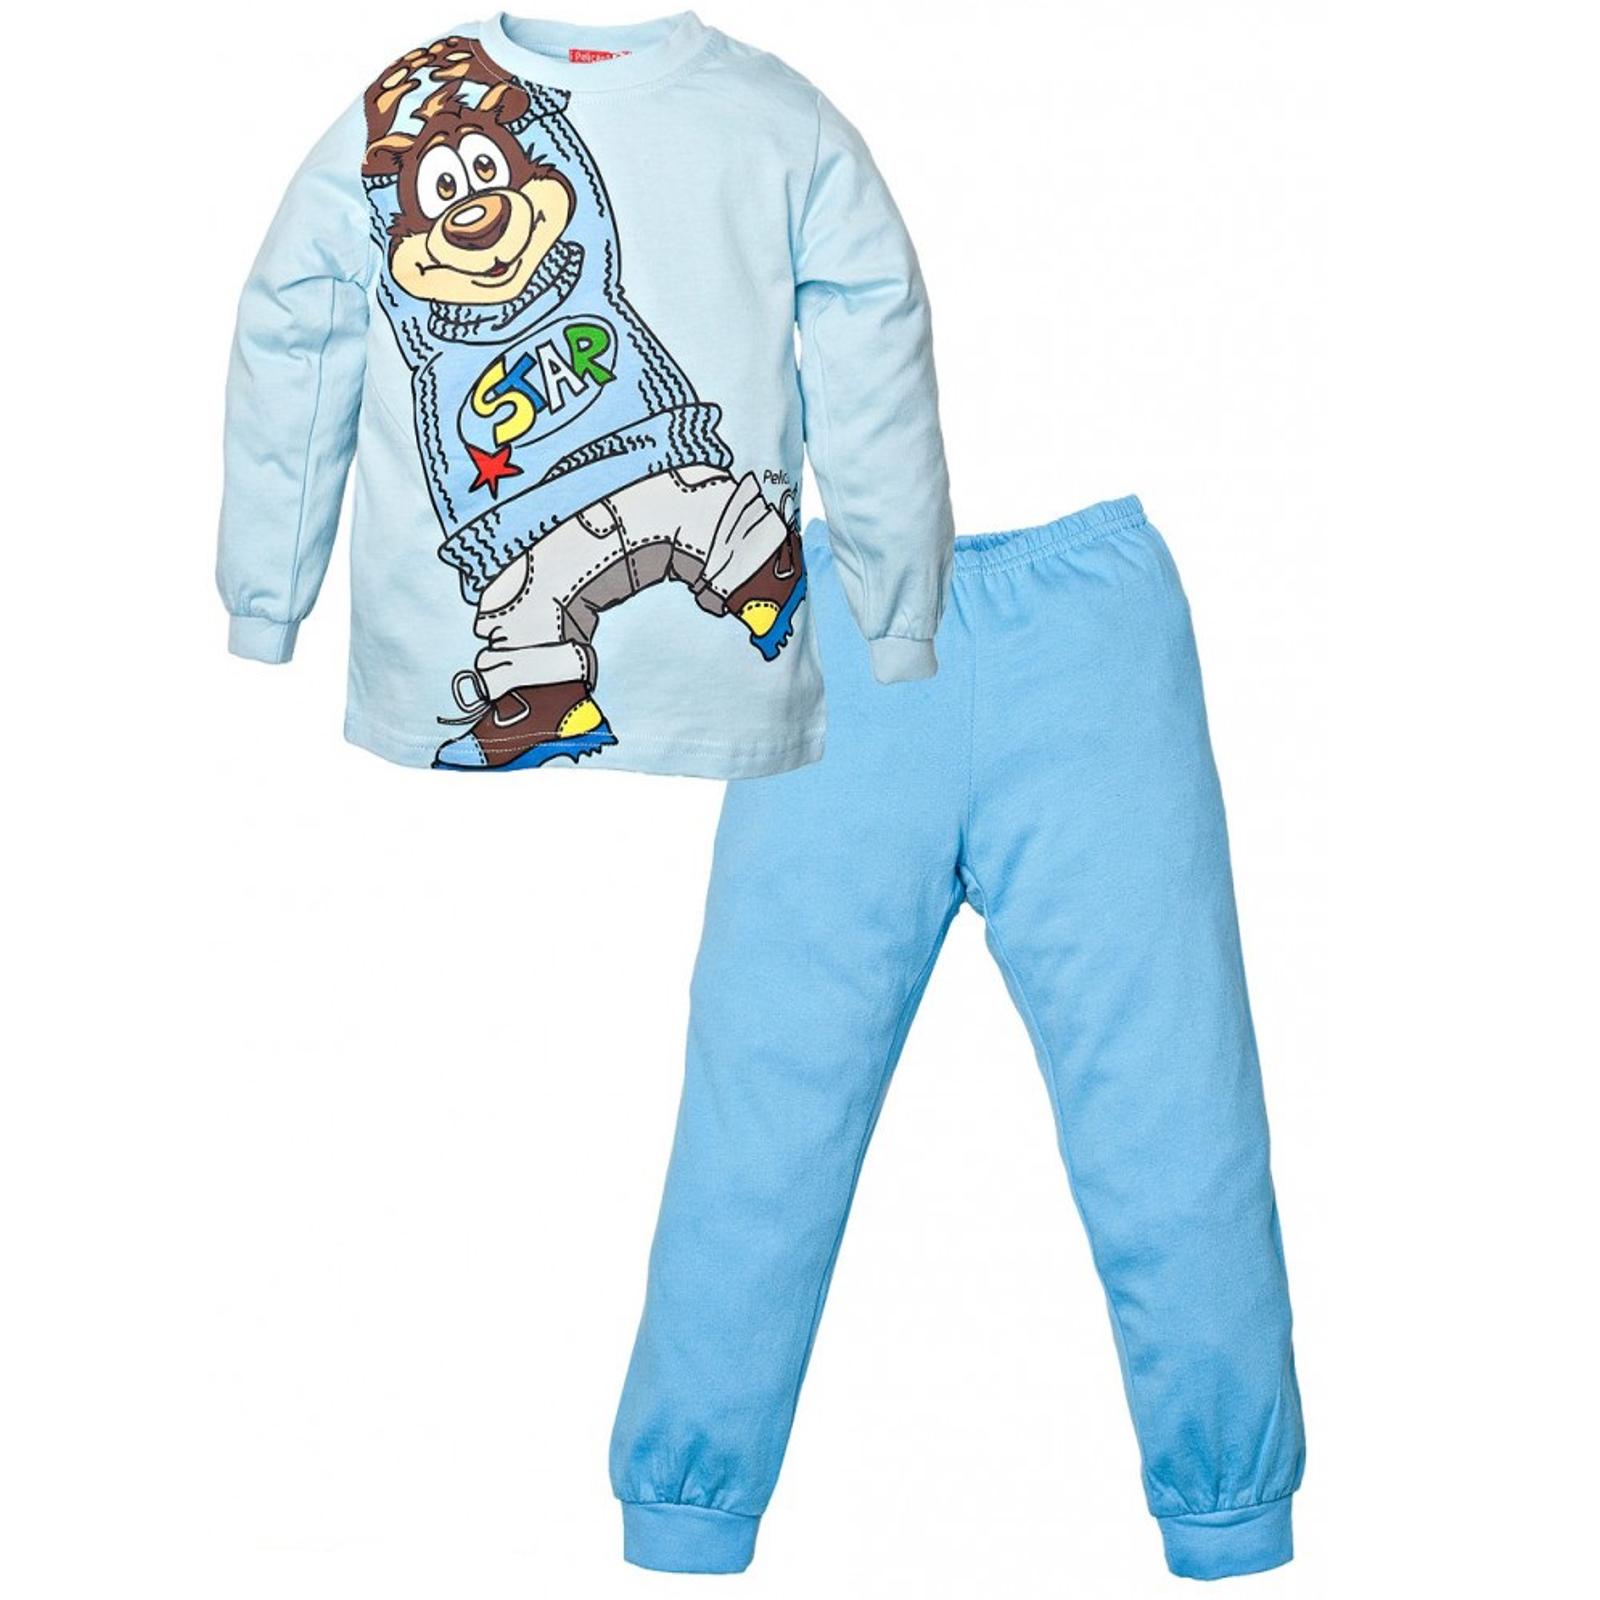 Пижама Pelican цвет Голубой BNJP298 возраст 5 лет